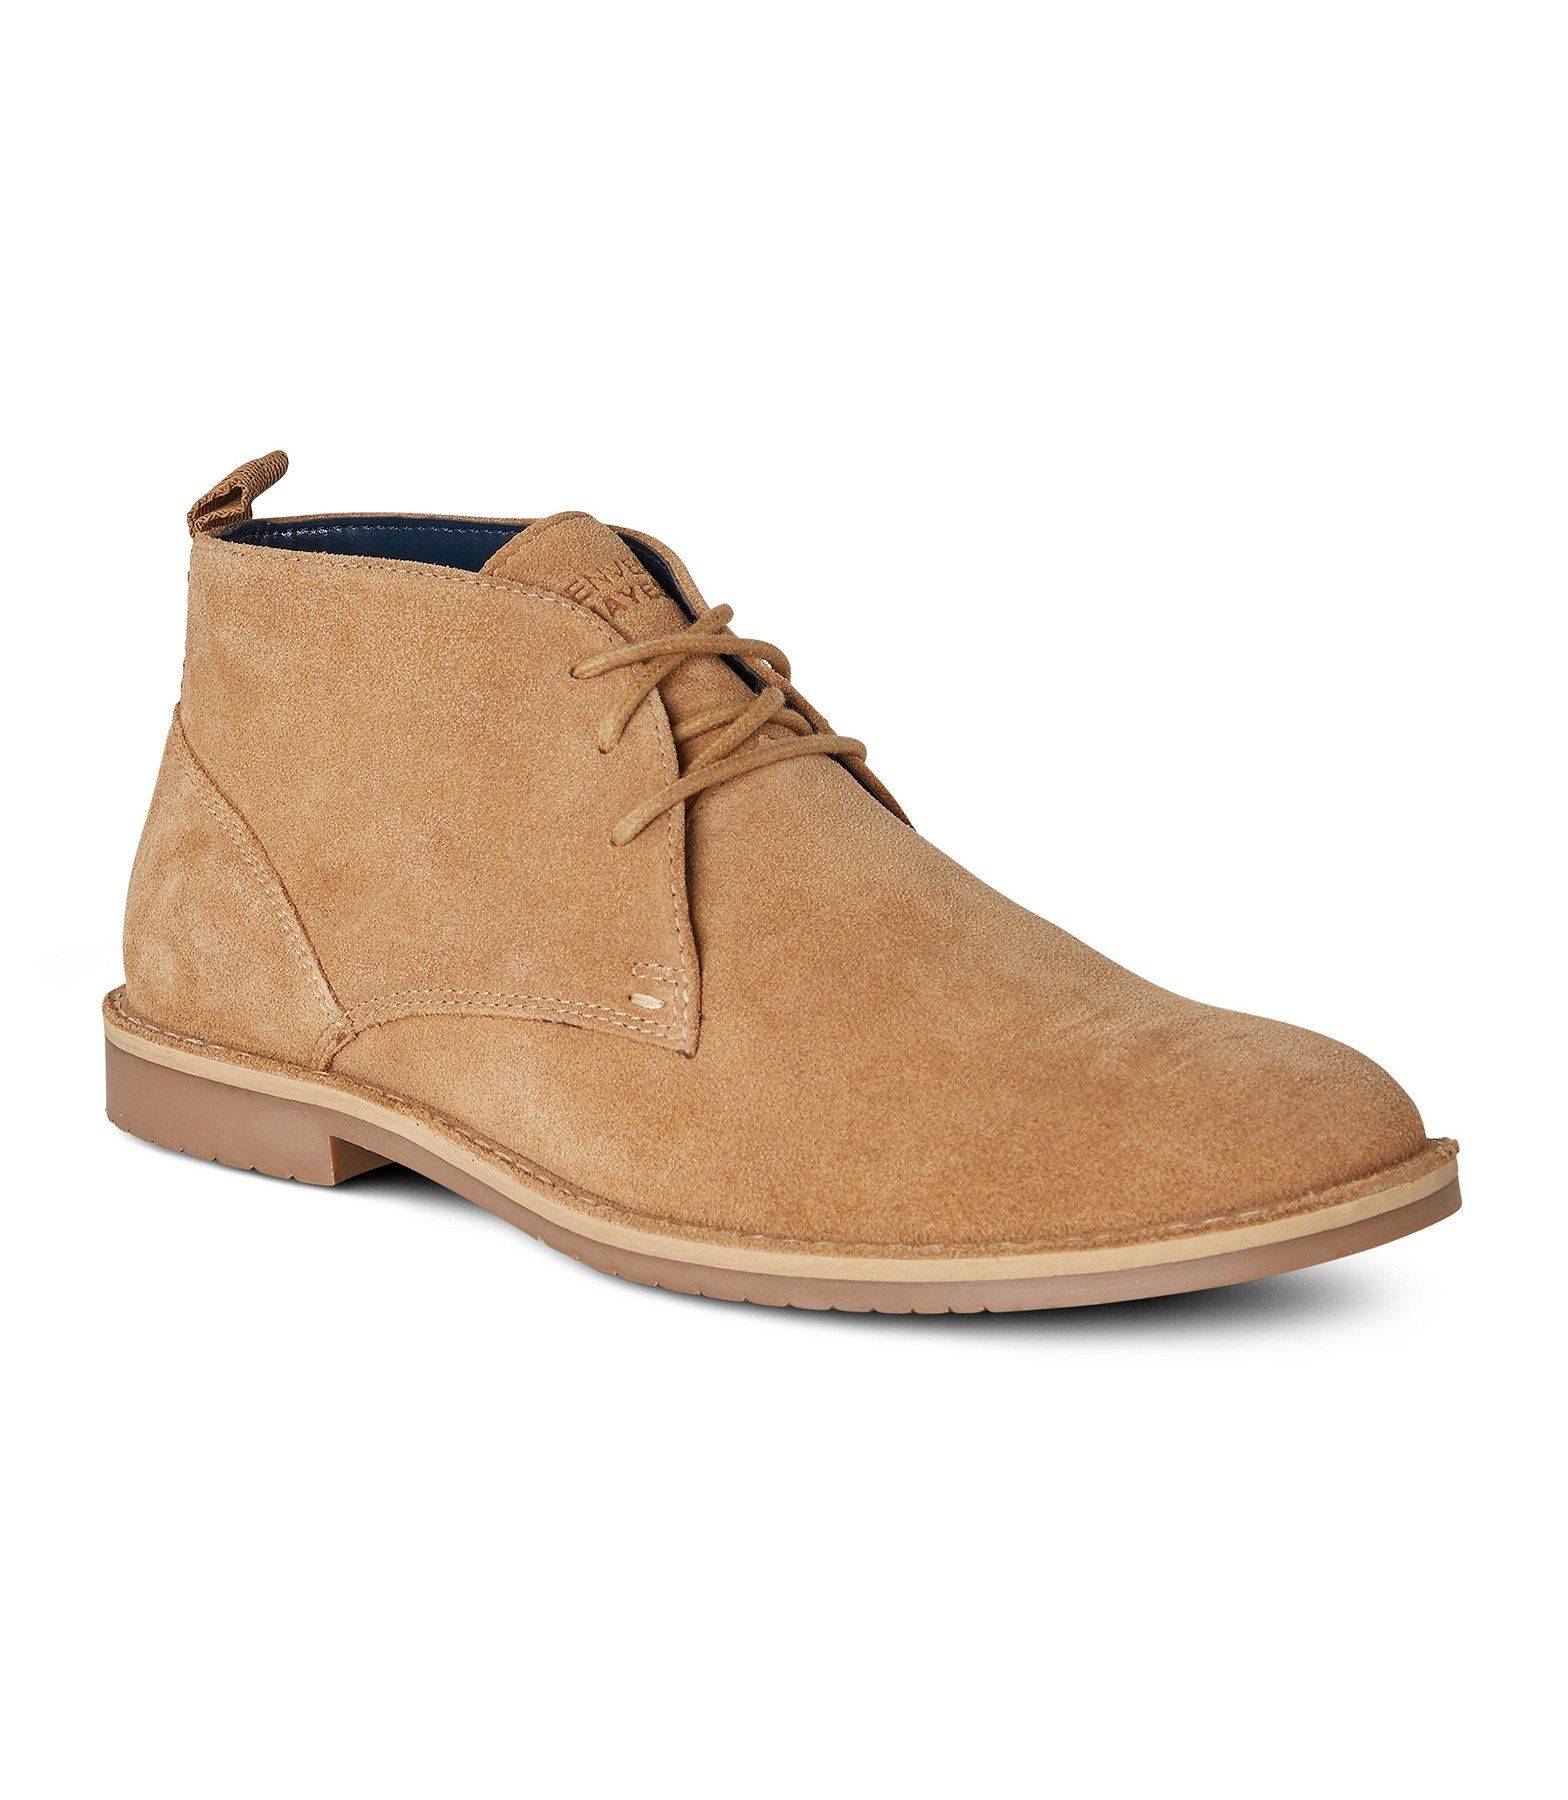 Men S Carleton Desert Boots Mark S Boots Chukka Boots Desert